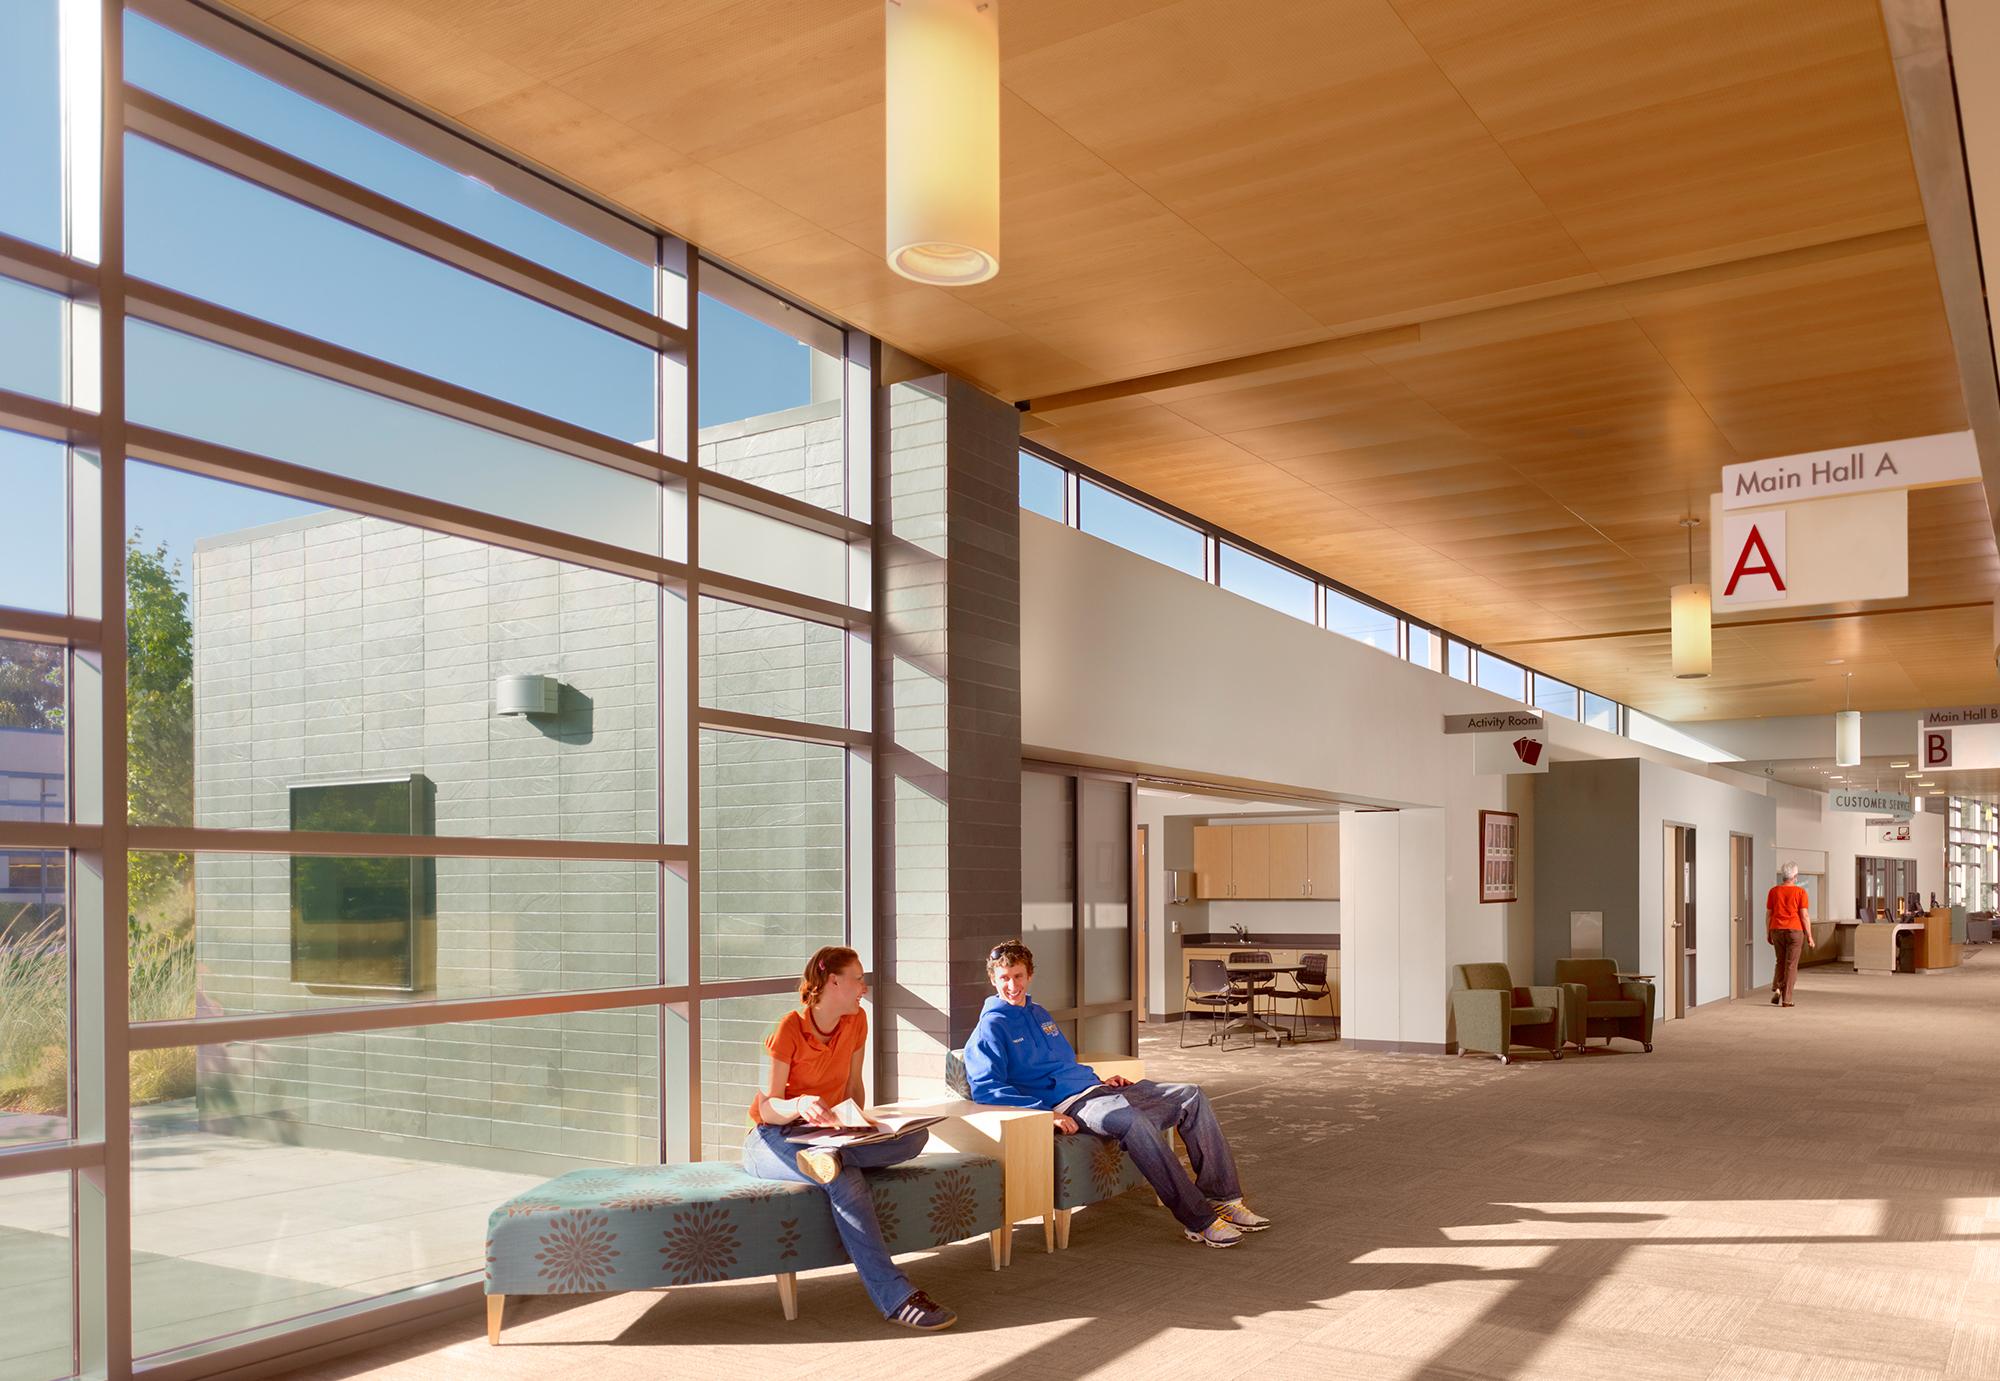 San Leandro Senior Community Center central corridor